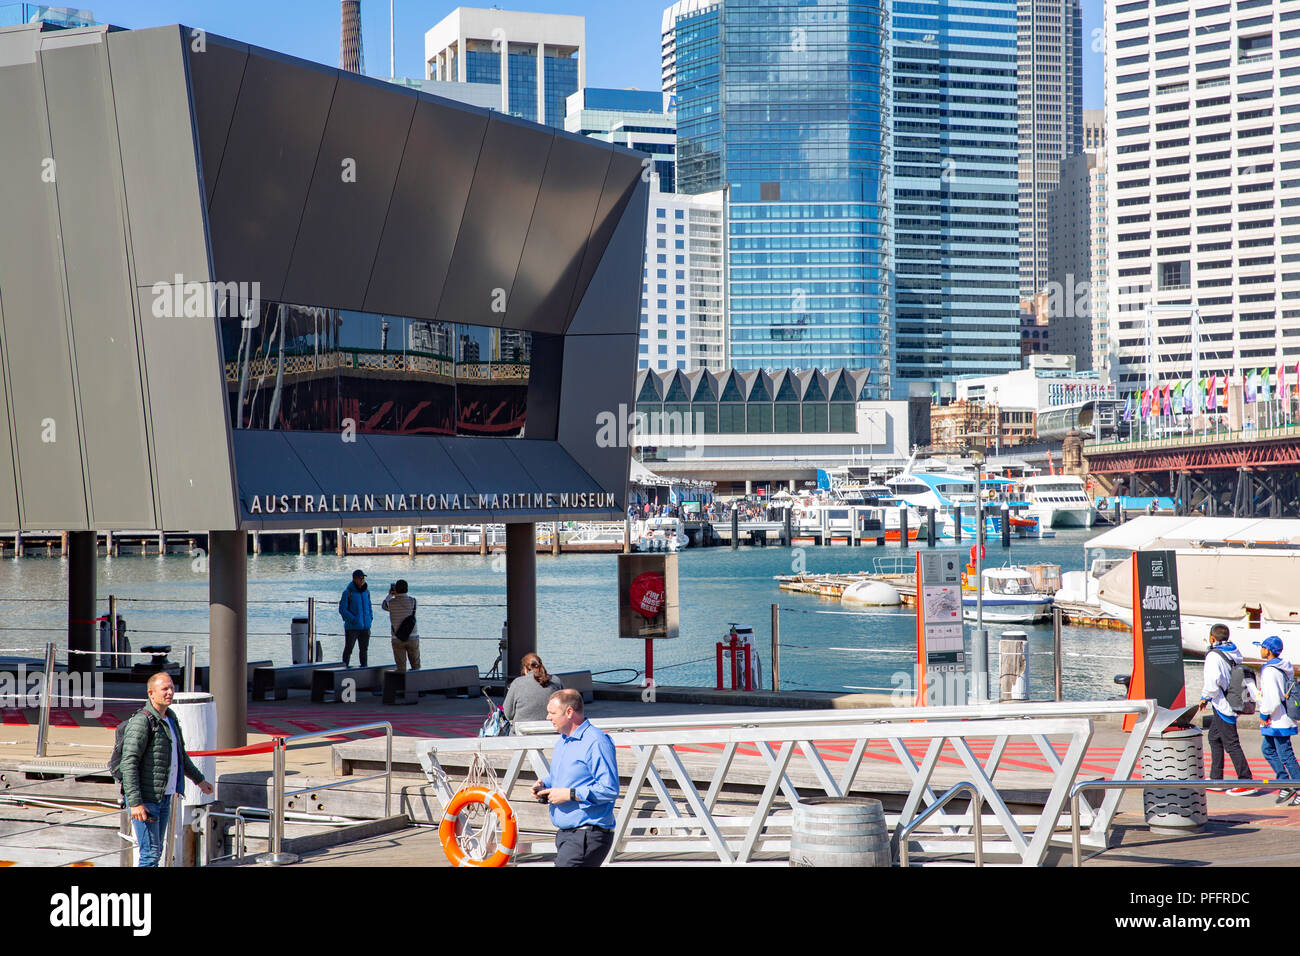 Australian National Maritime Museum in Darling Harbour,Sydney,Australia - Stock Image